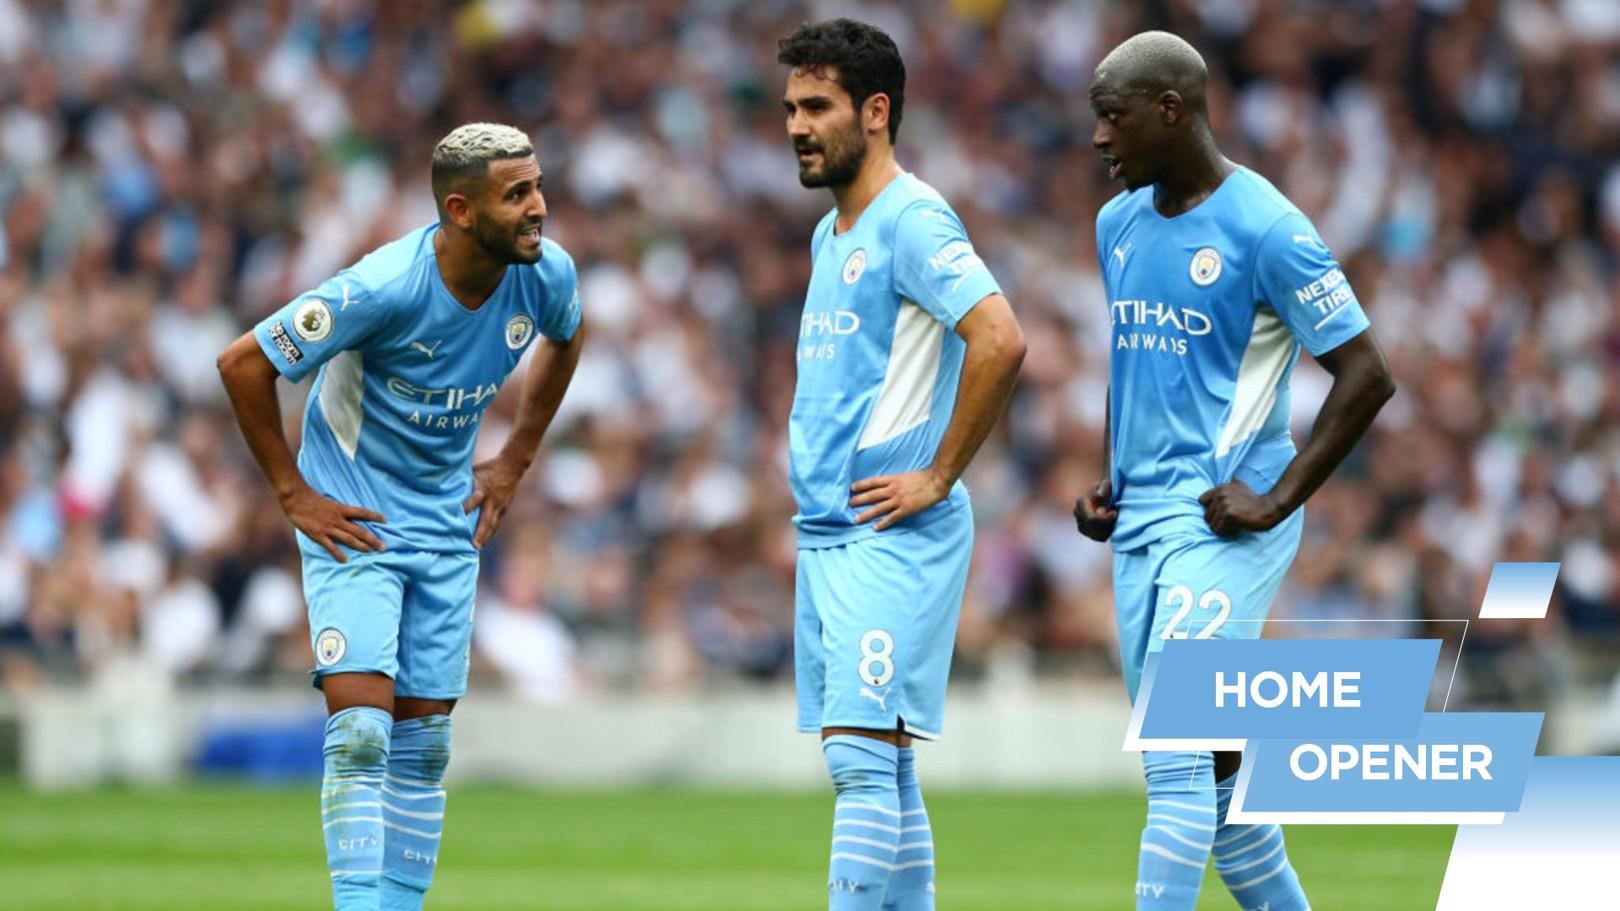 TV Mana Yang Menayangkan Manchester City v Norwich?